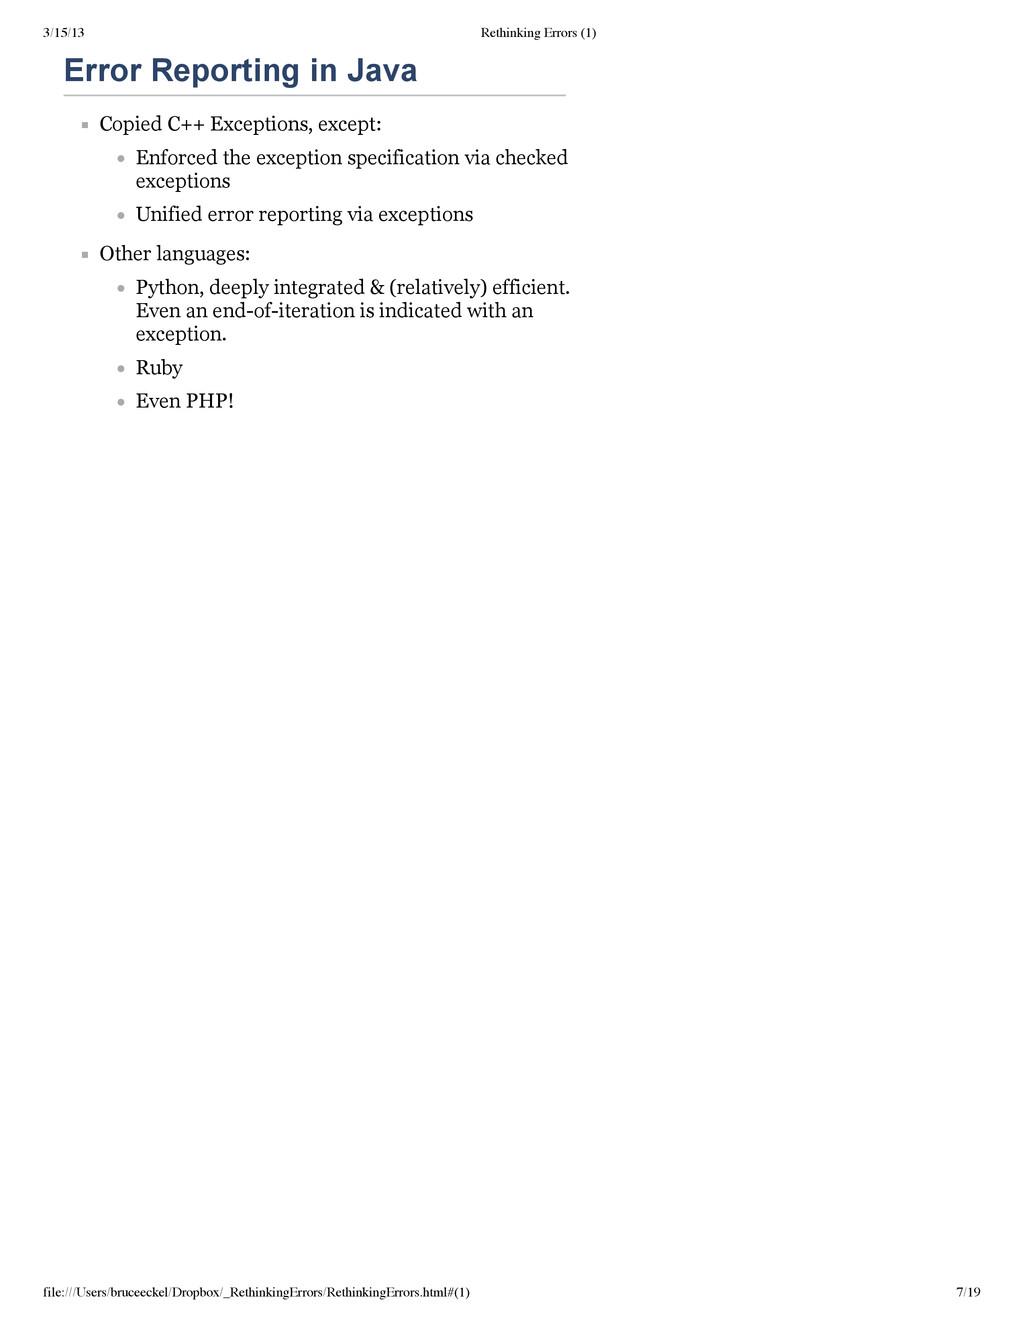 3/15/13 Rethinking Errors (1) file:///Users/bru...